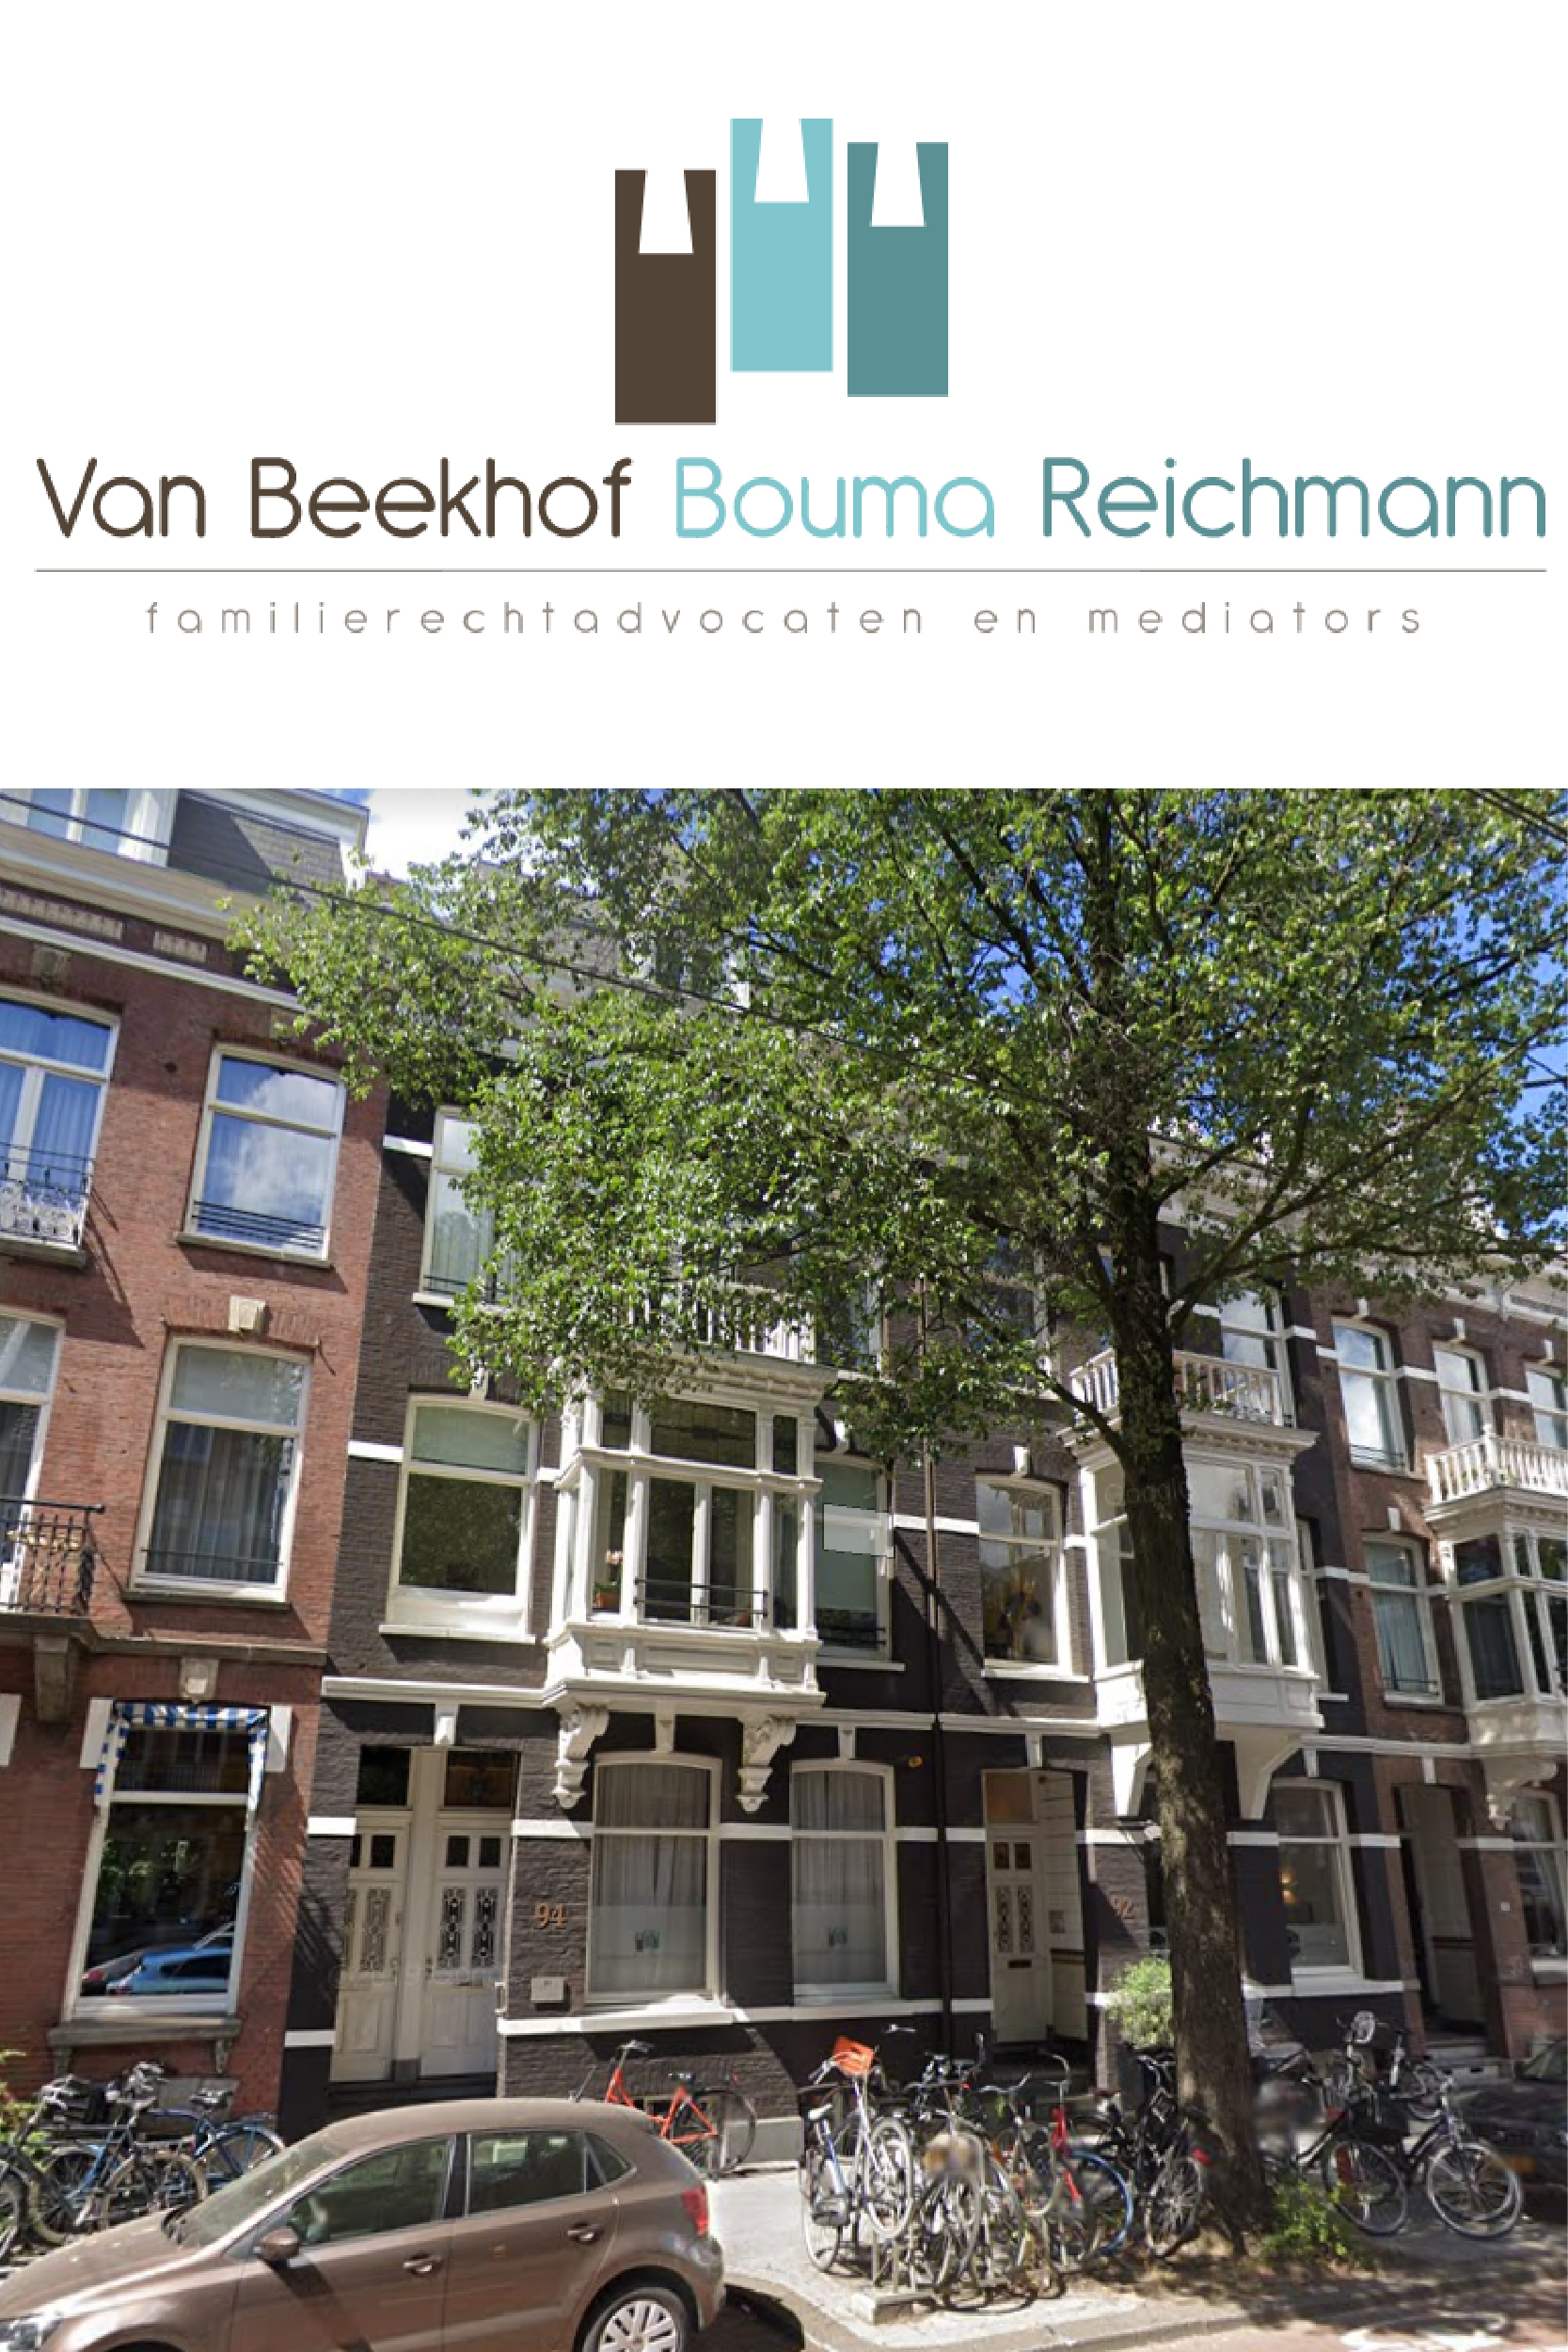 Van Beekhof Bouma Reichmann